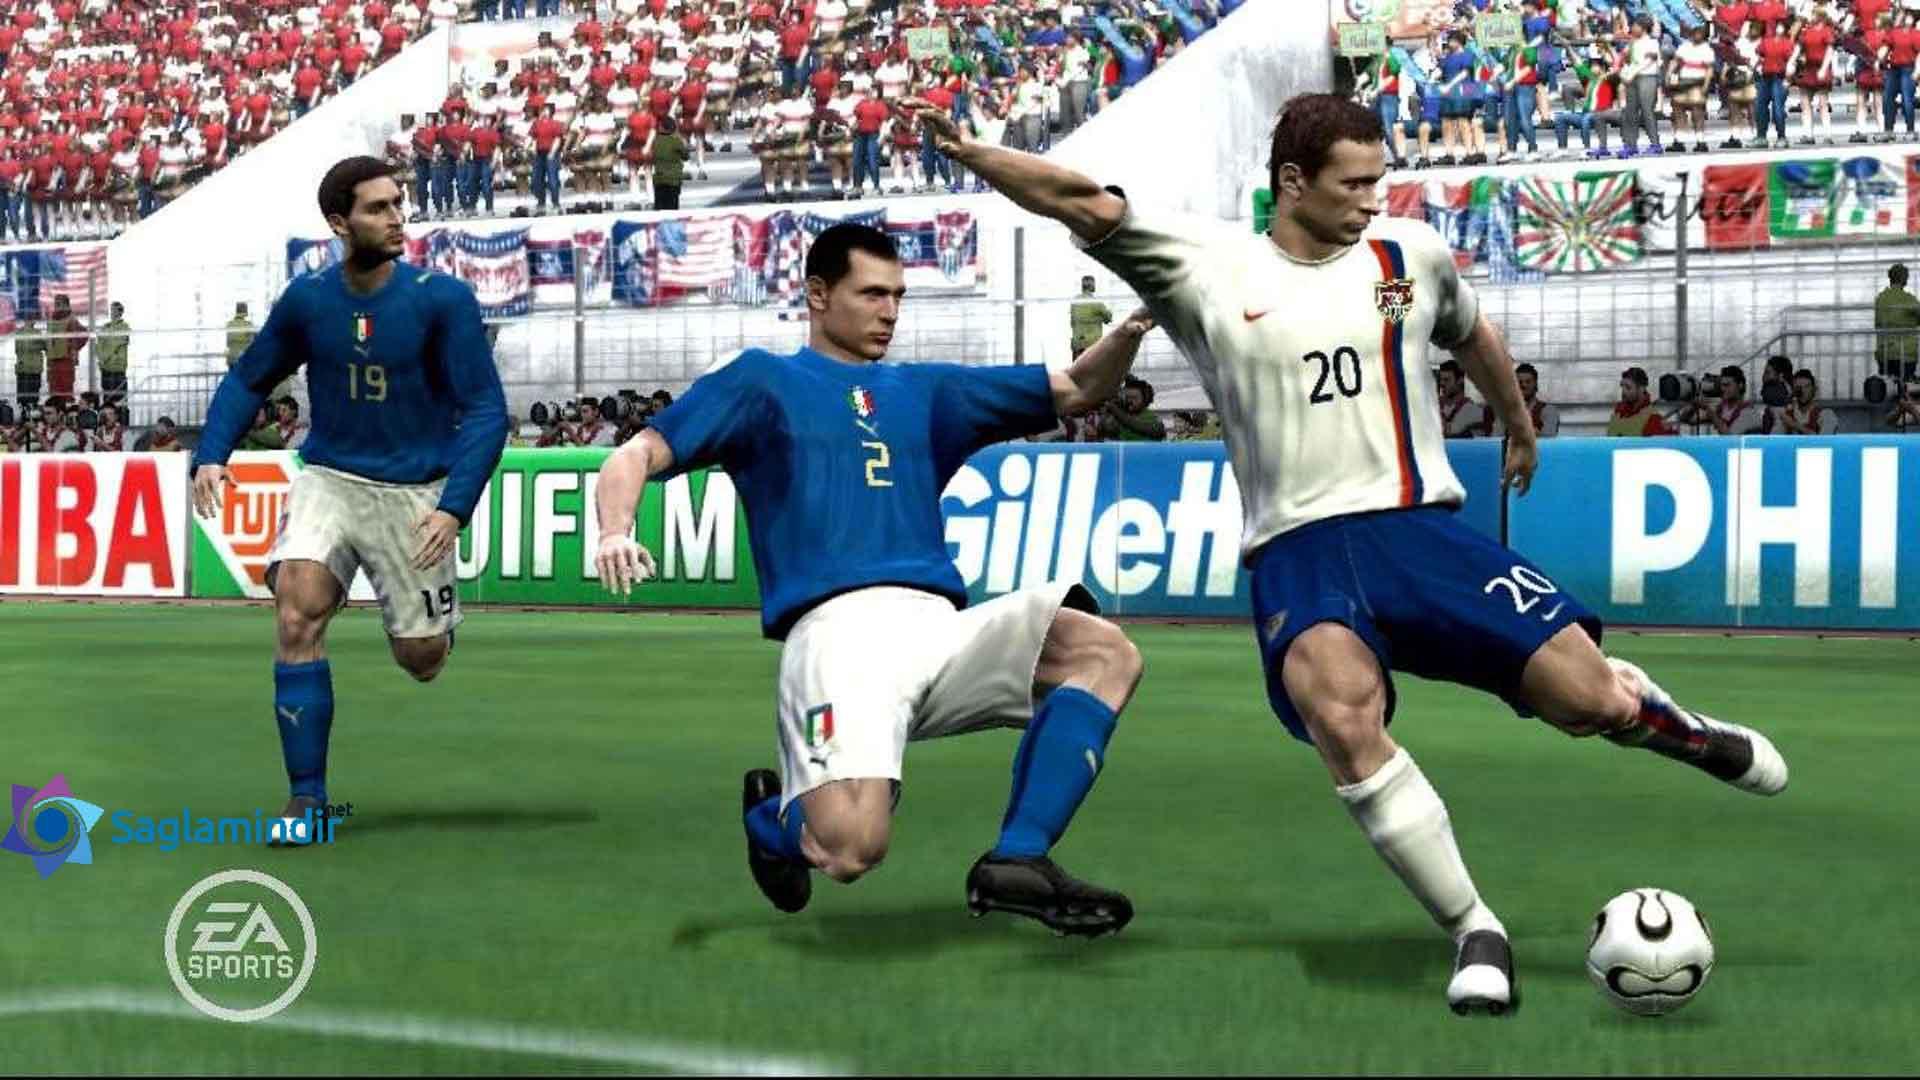 Fifa-World-Cup-2006-full-indir